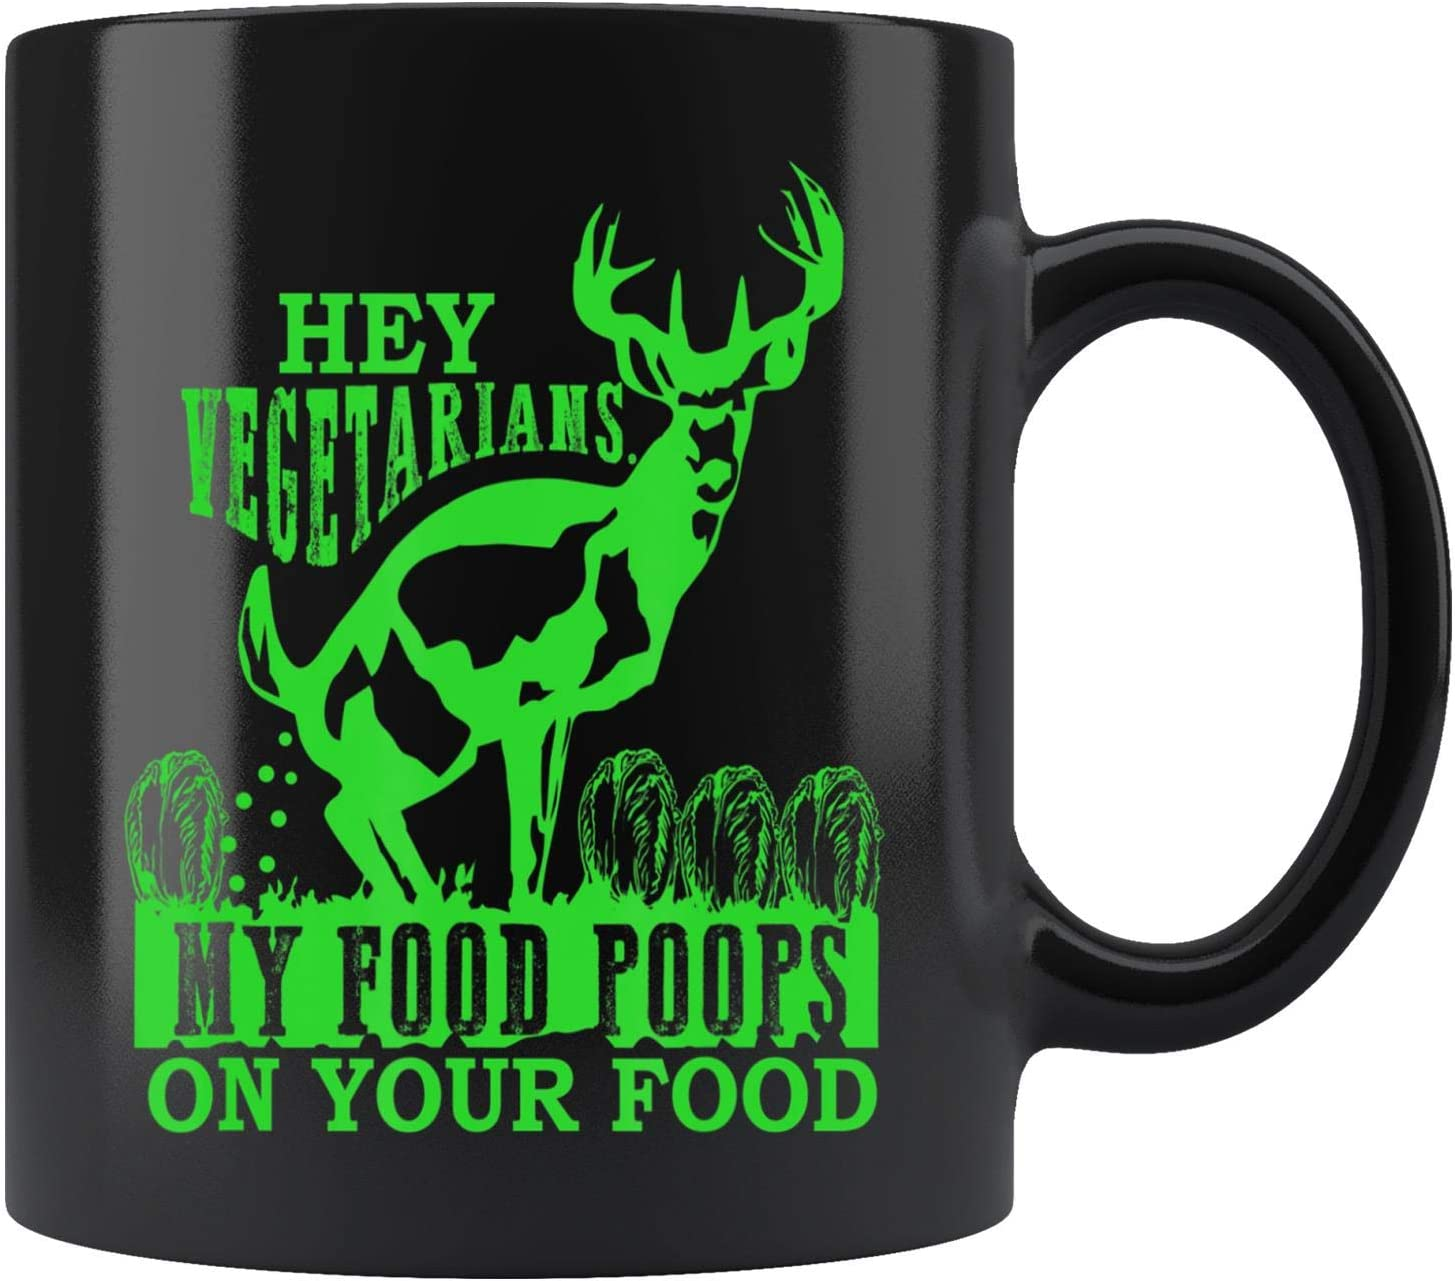 Hey Vegetarians My Food Poops on Yours funny hunting season Mug Coffee Mug 11oz Gift Tea Cups 15oz